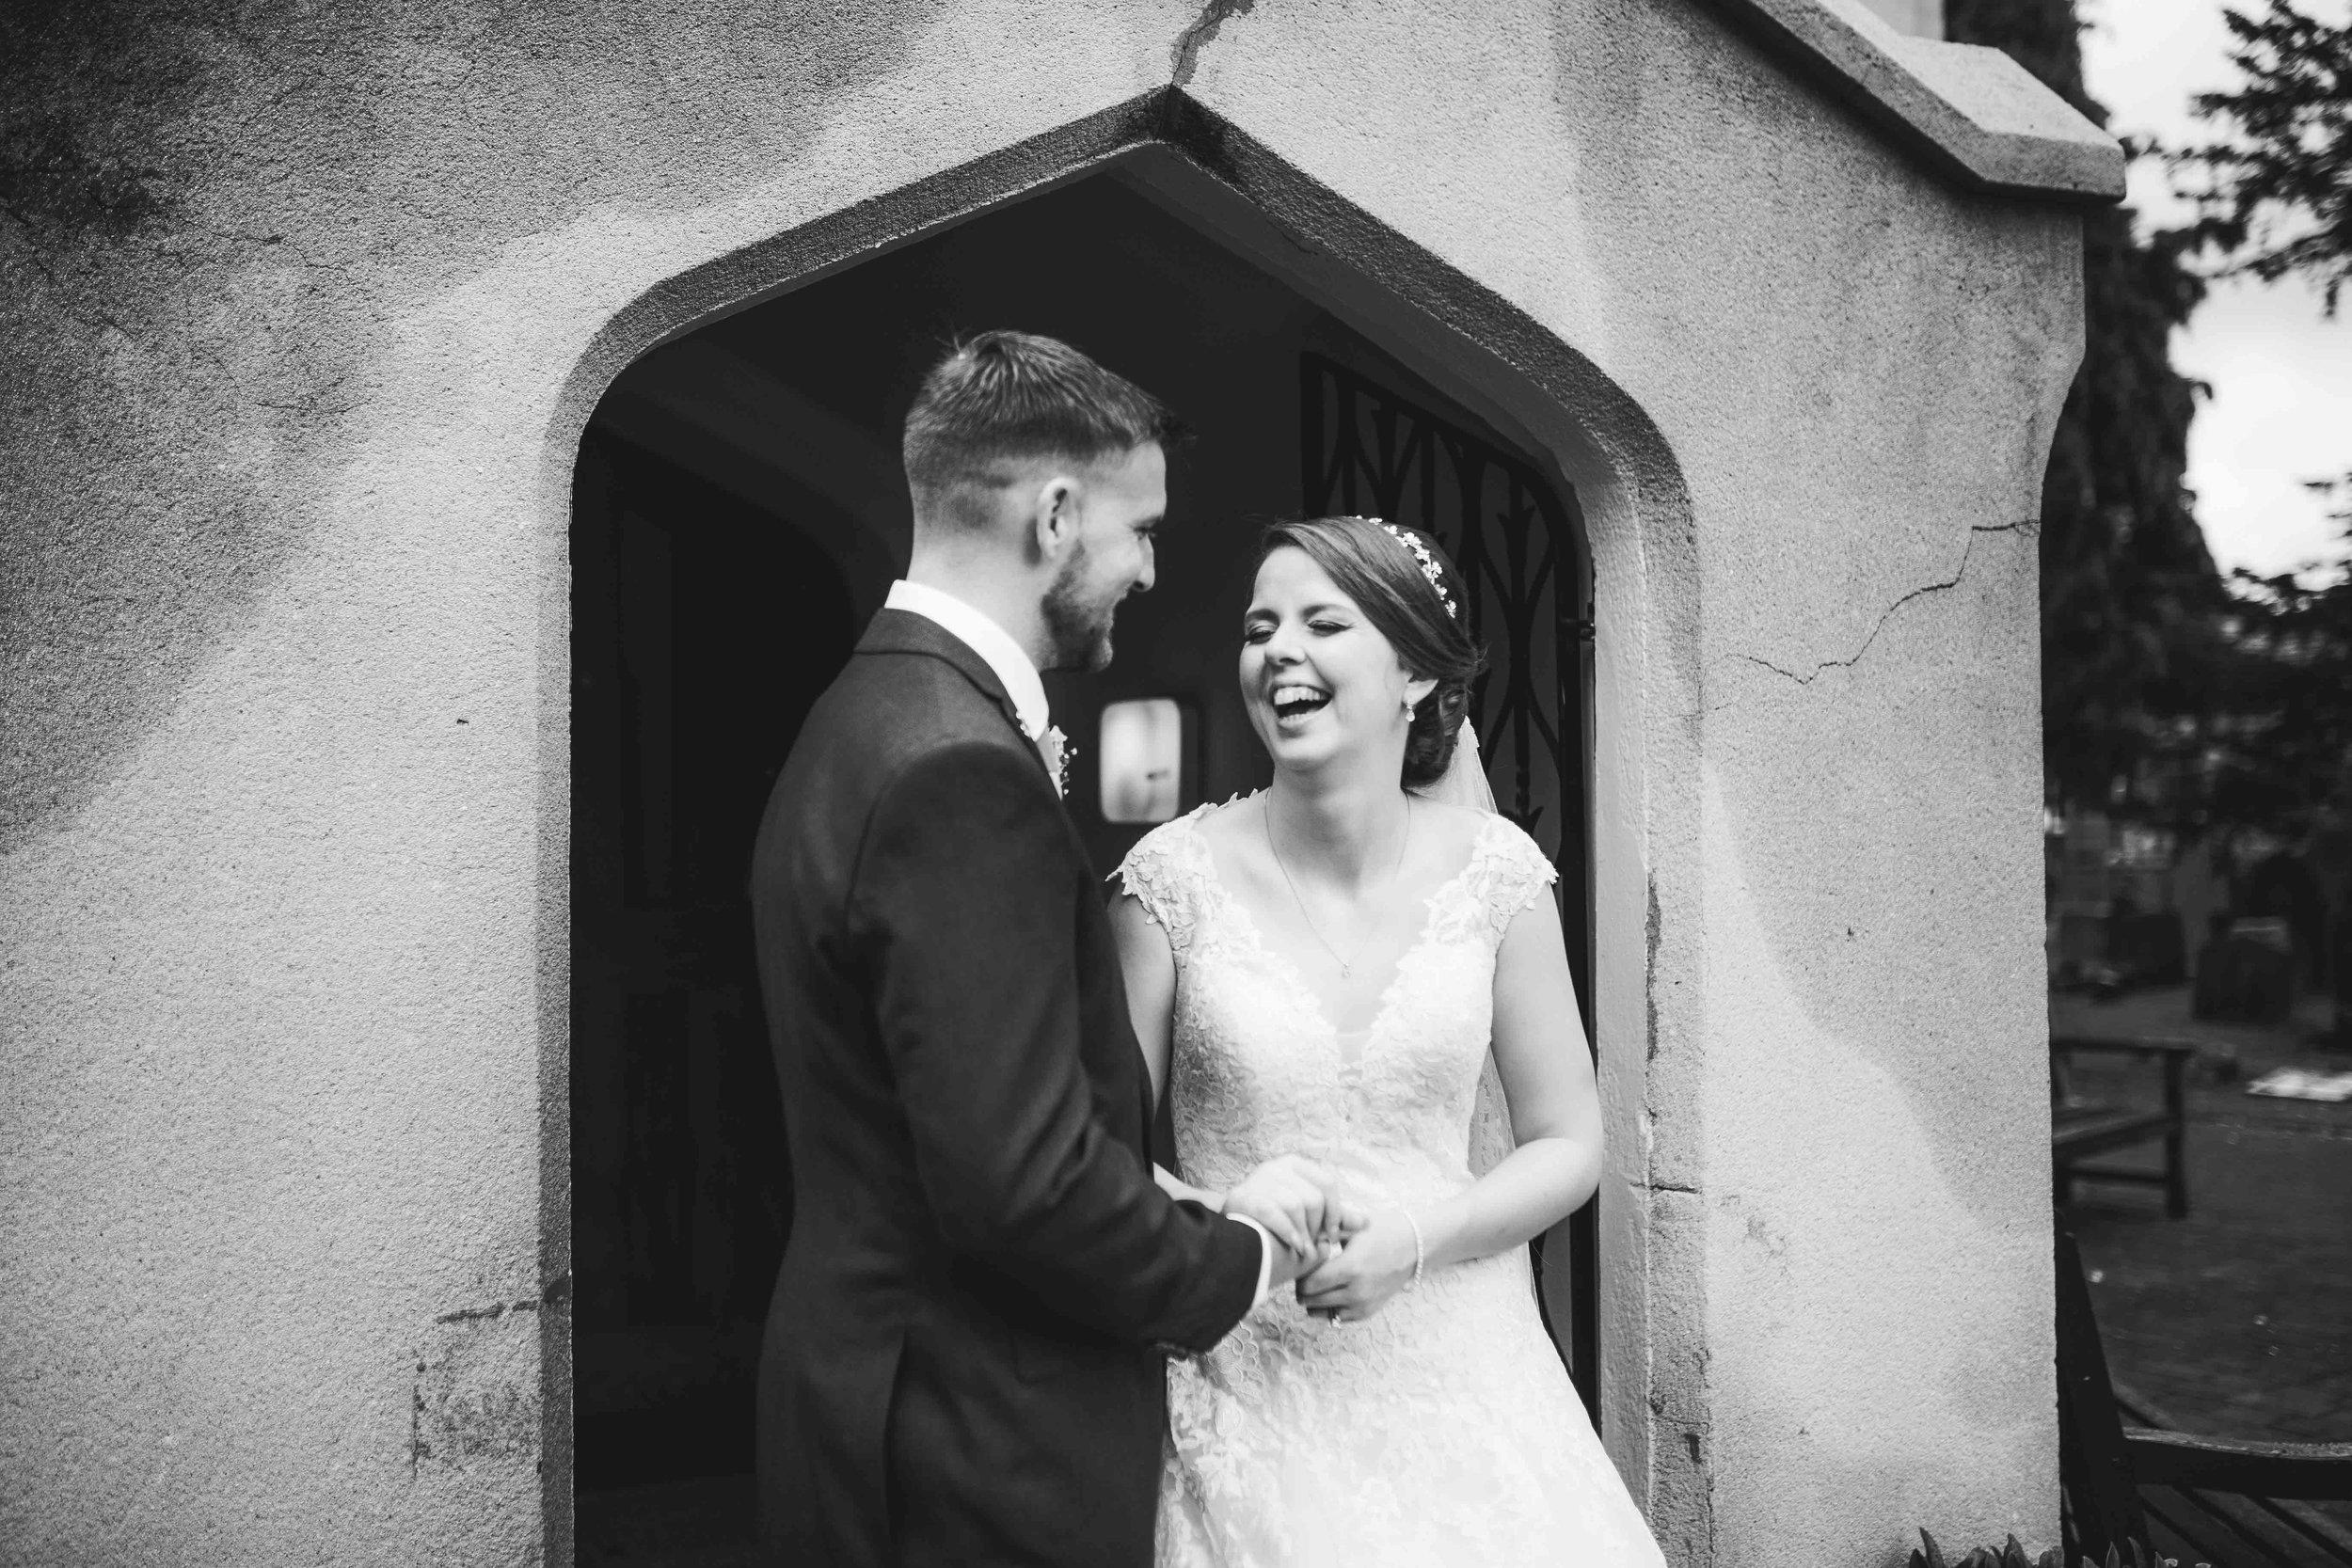 Lea-cooper-photography-willenhall-wolverhampton-wedding-photographer-birmingham-shirley-west-midlands-ceremony-church-13.JPG